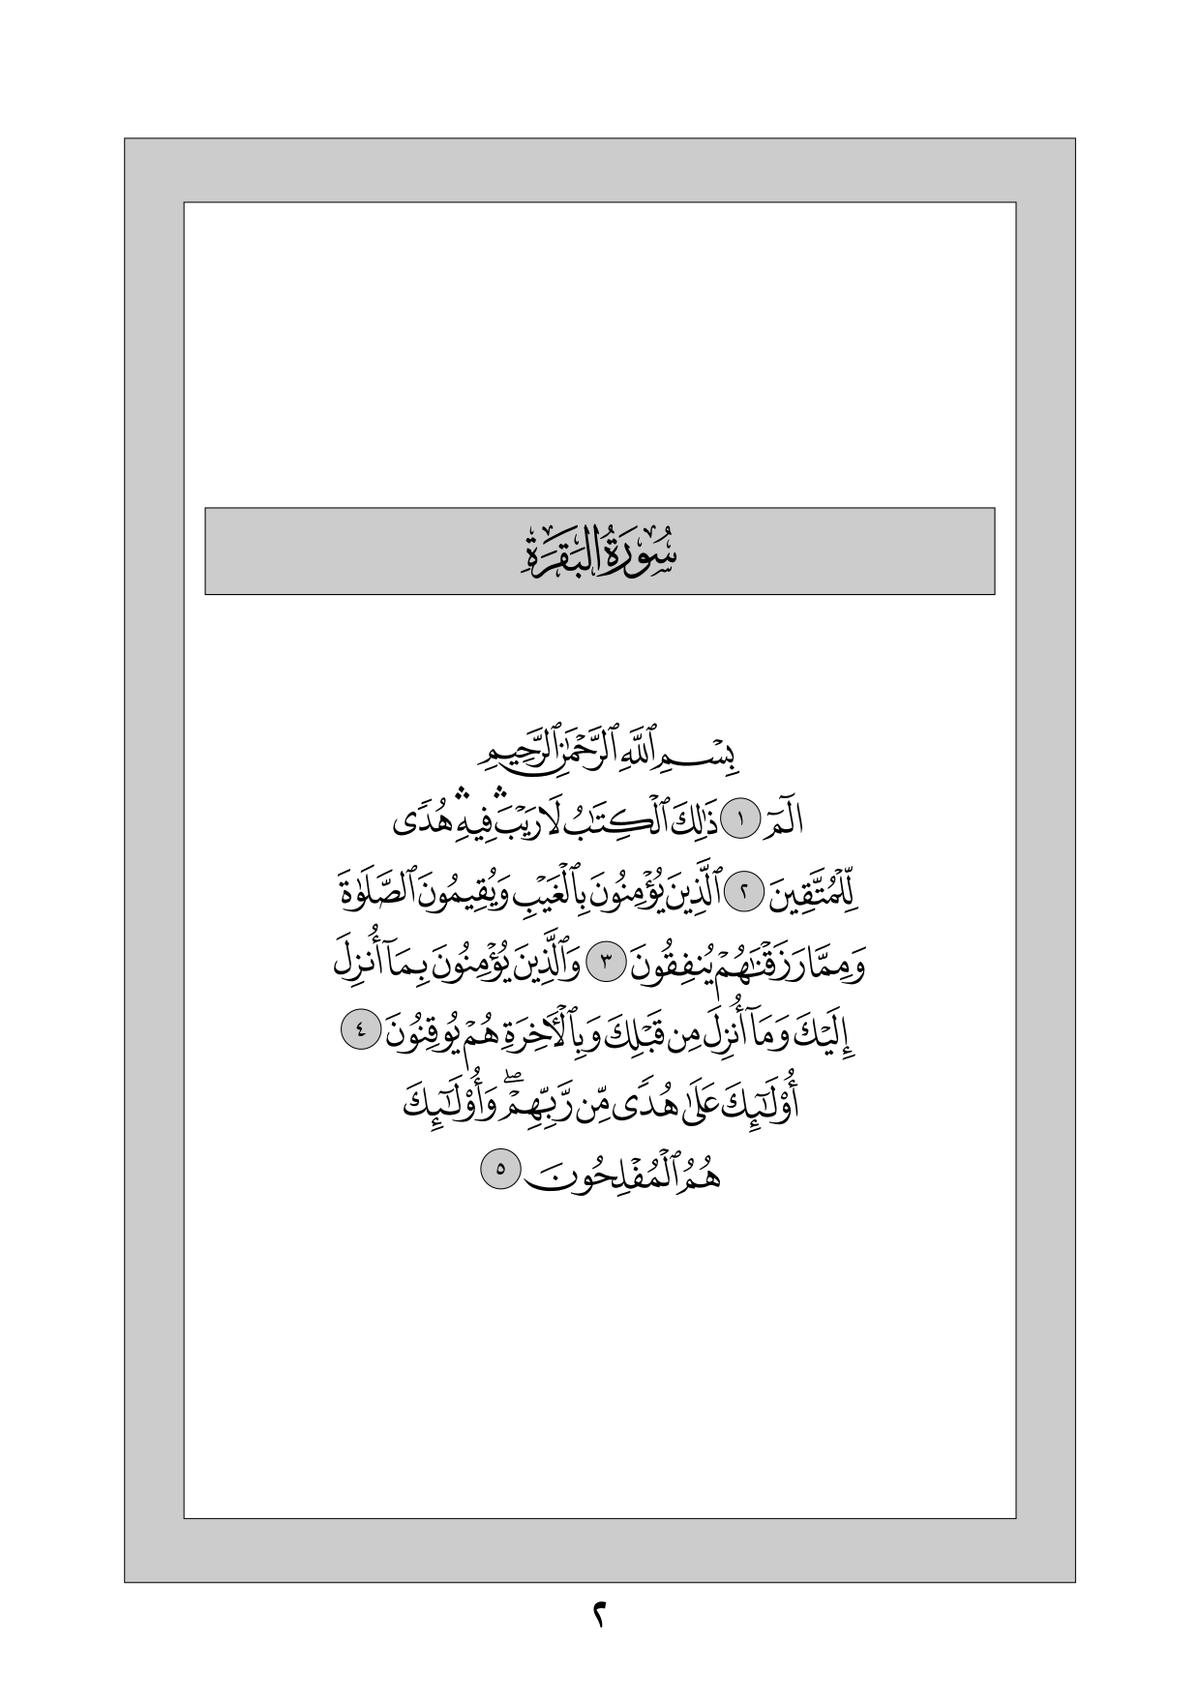 Surah Al Baqarah Wikipedia Bahasa Indonesia Ensiklopedia